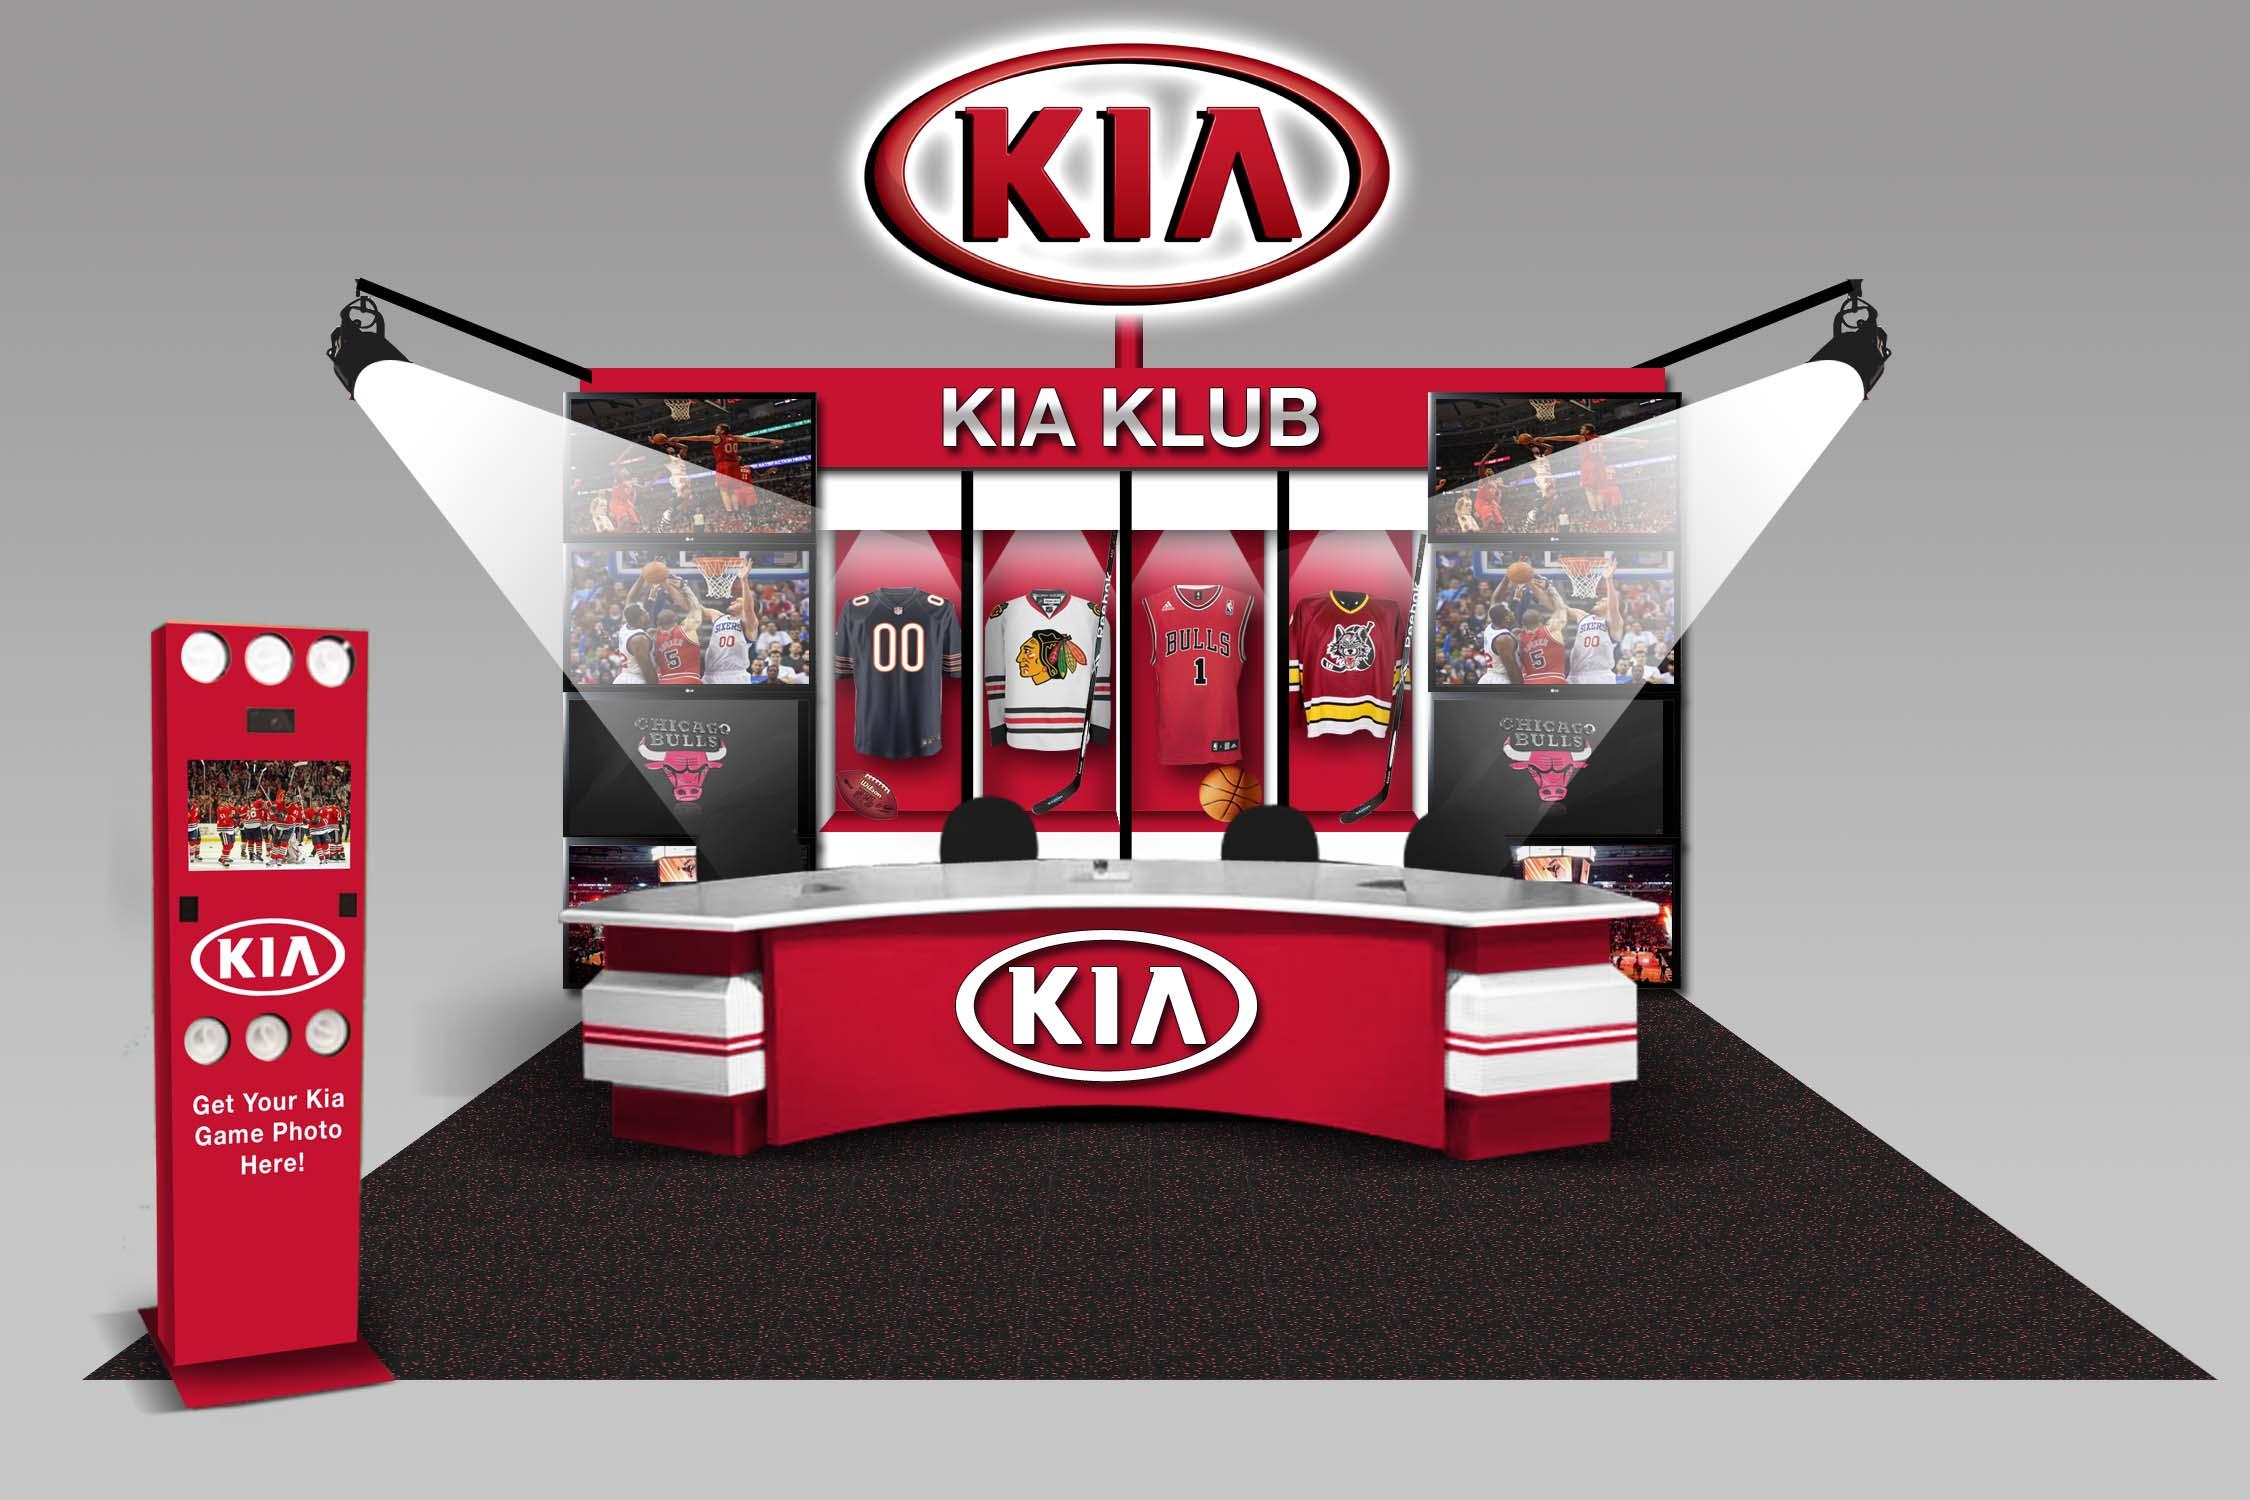 Kia_Auto_Show_Sponsorship_Booth_Concept_ON_DECK_CS.jpg